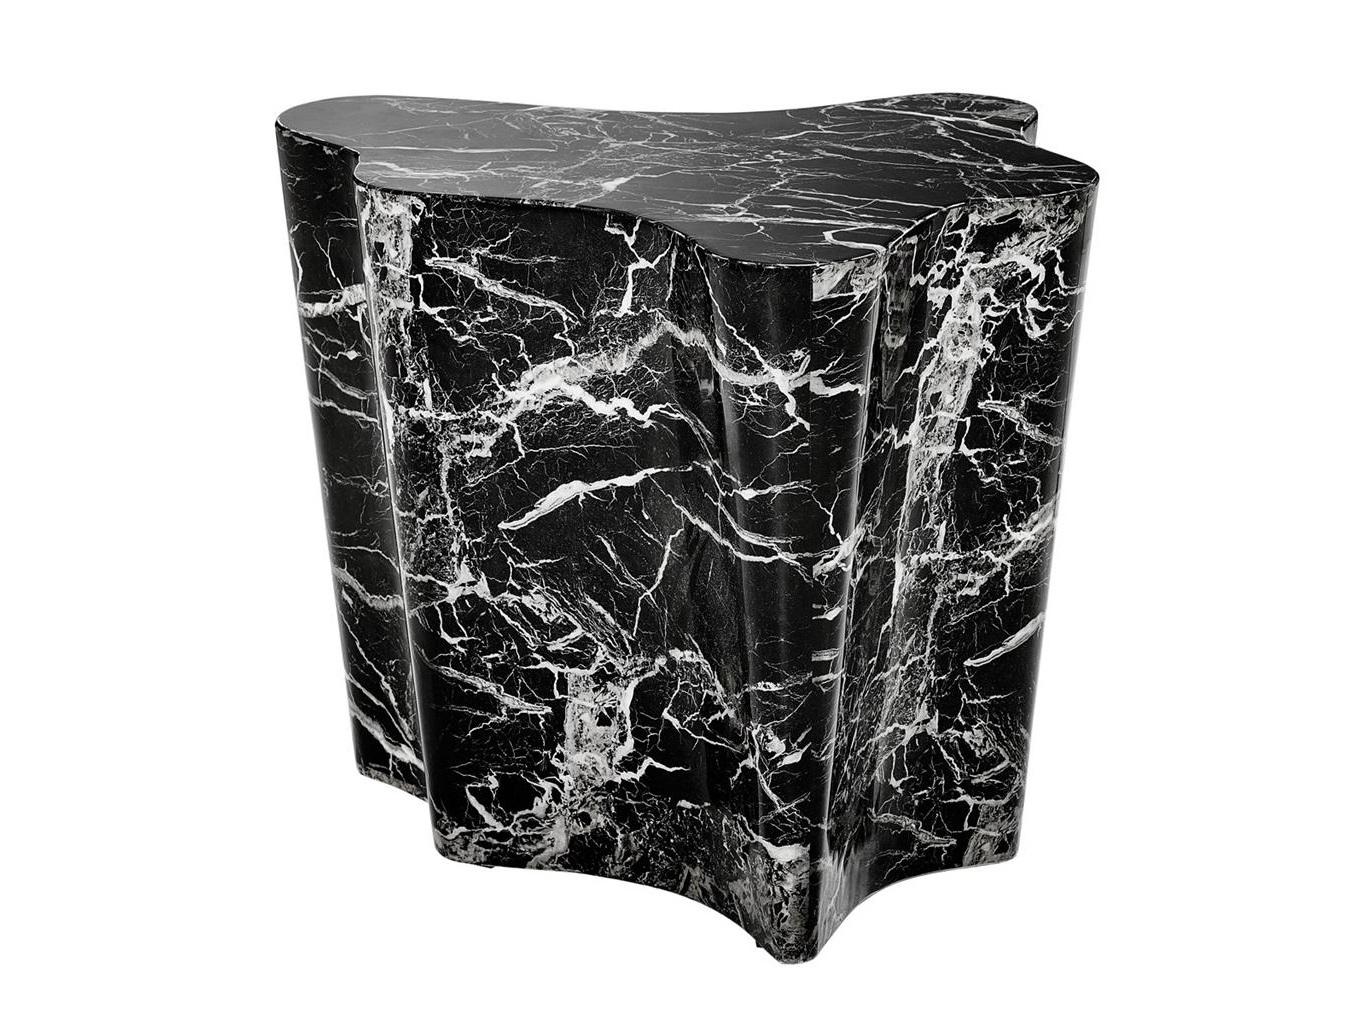 СтолПриставные столики<br>Столик Side Table Sceptre с имитацией мрамора глянцевого черного цвета.<br><br>Material: Мрамор<br>Ширина см: 68.0<br>Высота см: 56.0<br>Глубина см: 62.0